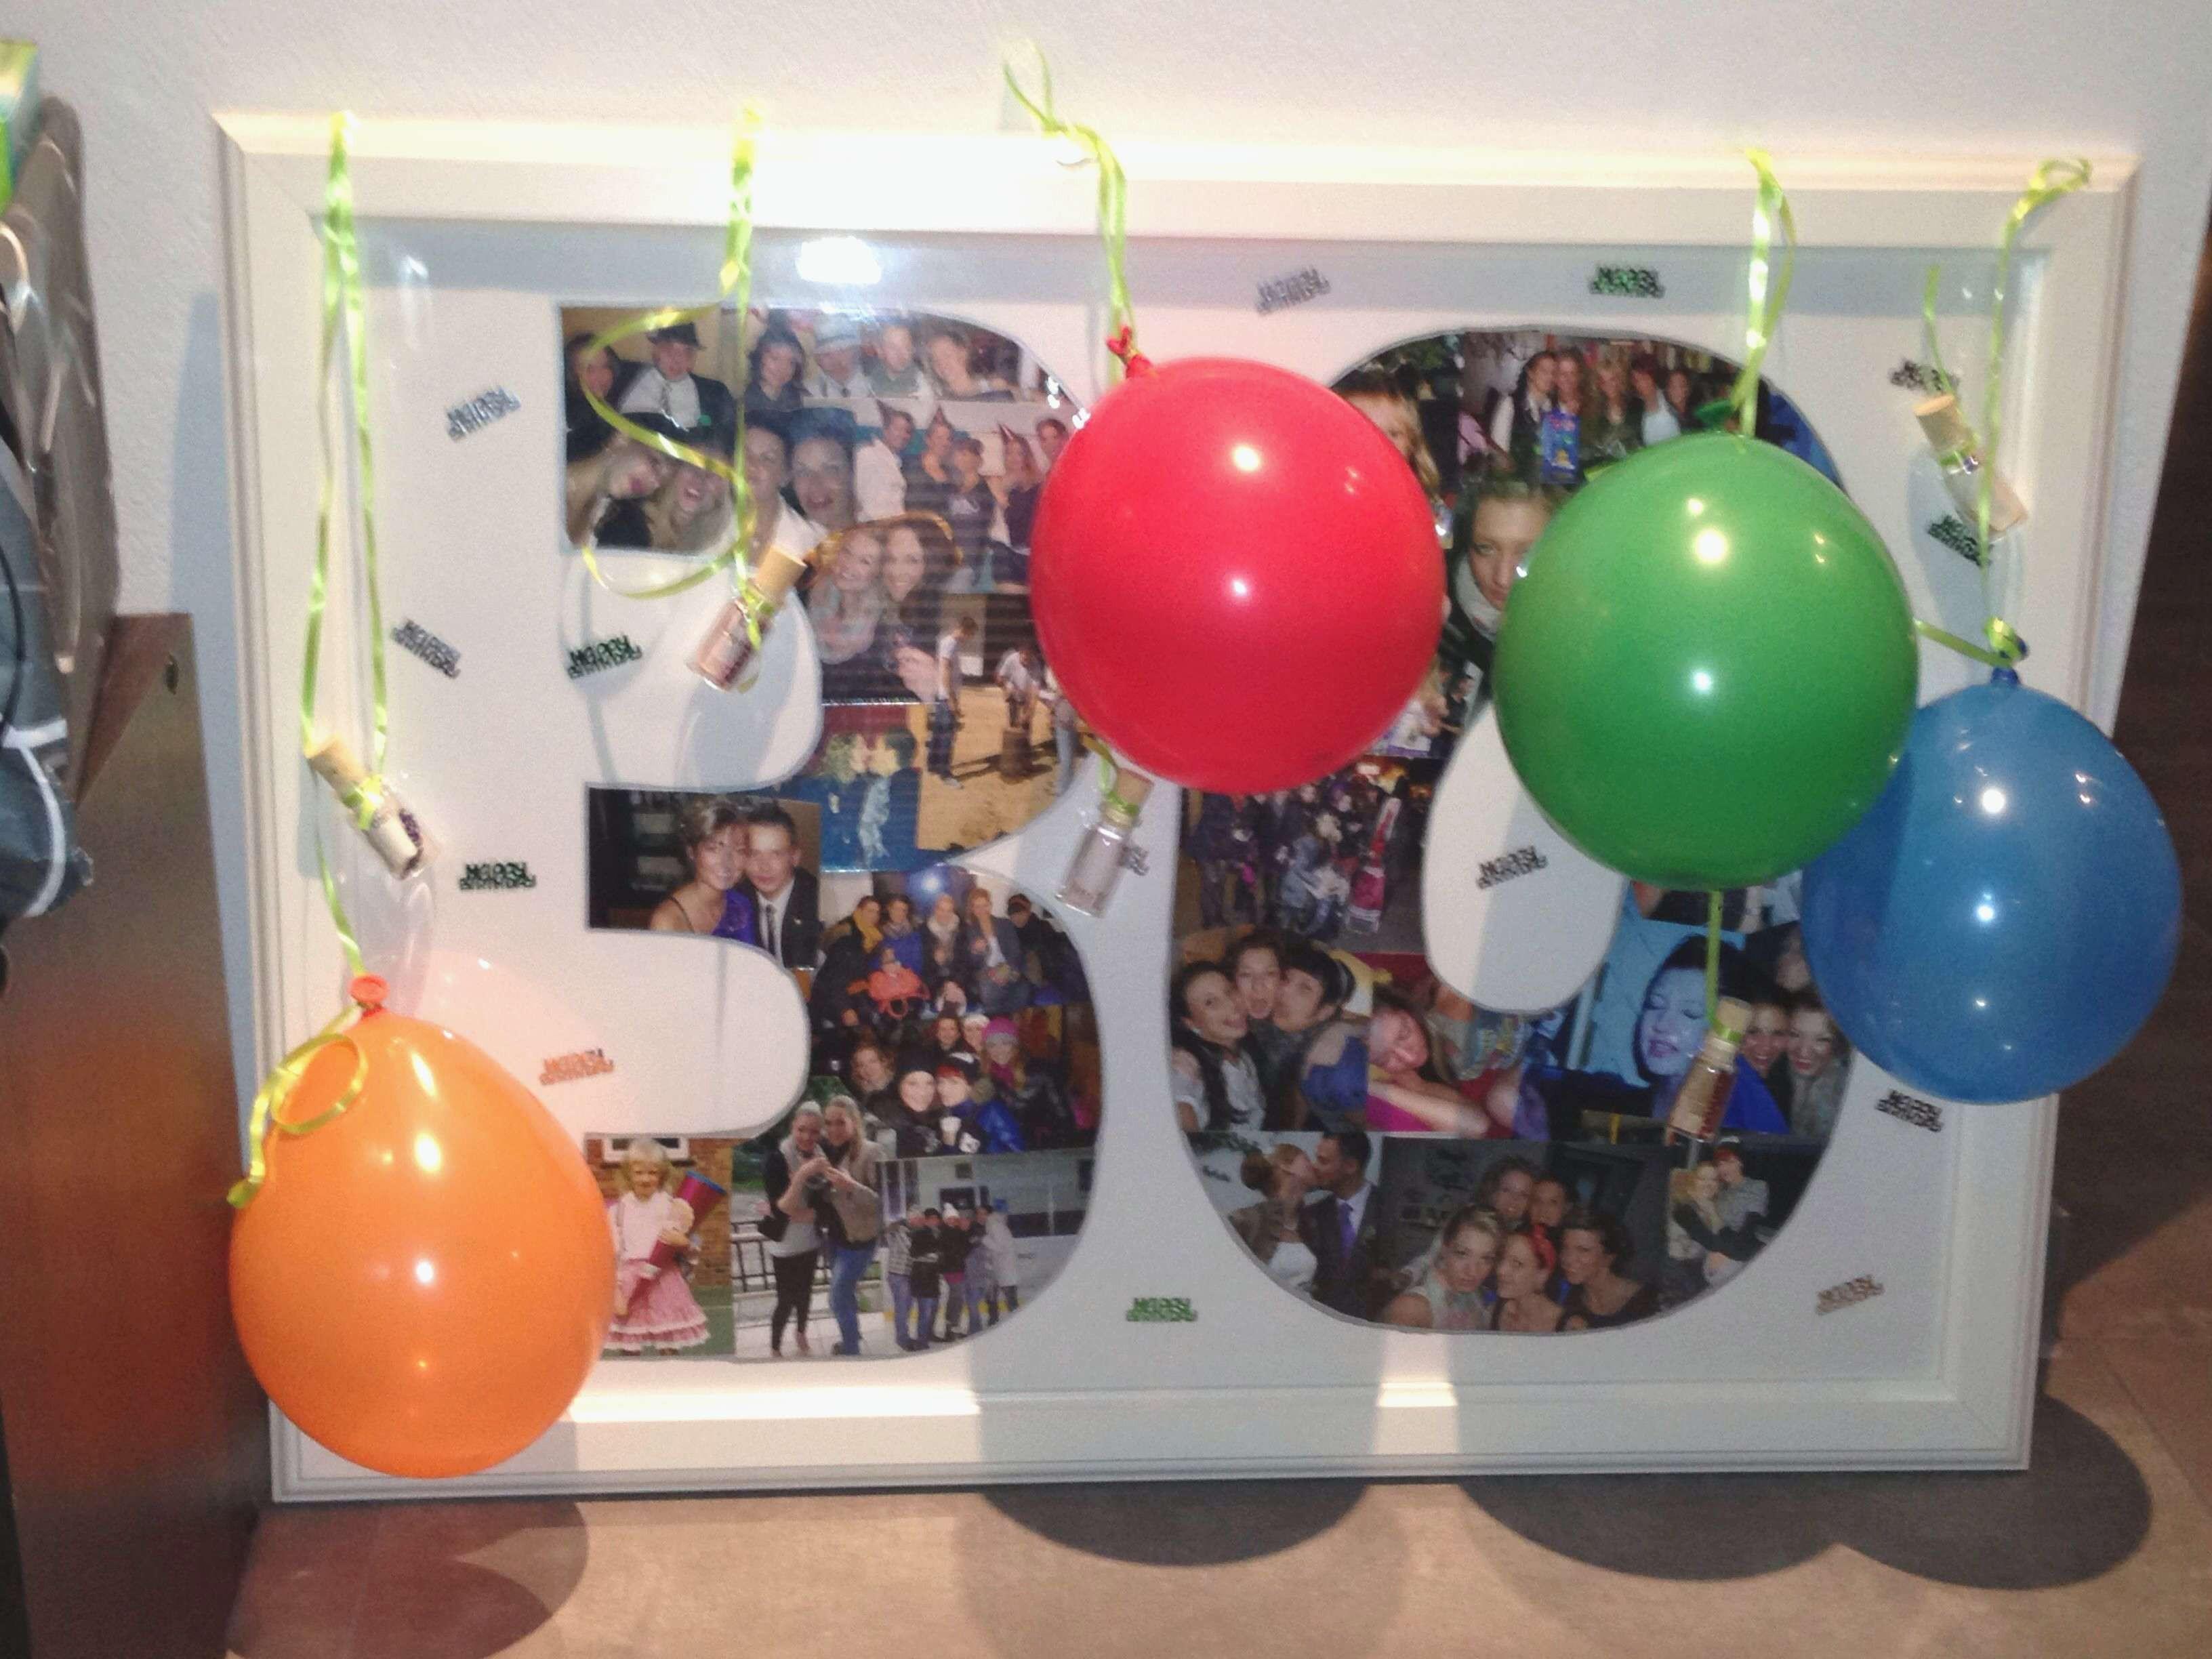 Geschenke Zum 18. Geburtstag Sohn  Geschenk 18 Geburtstag sohn